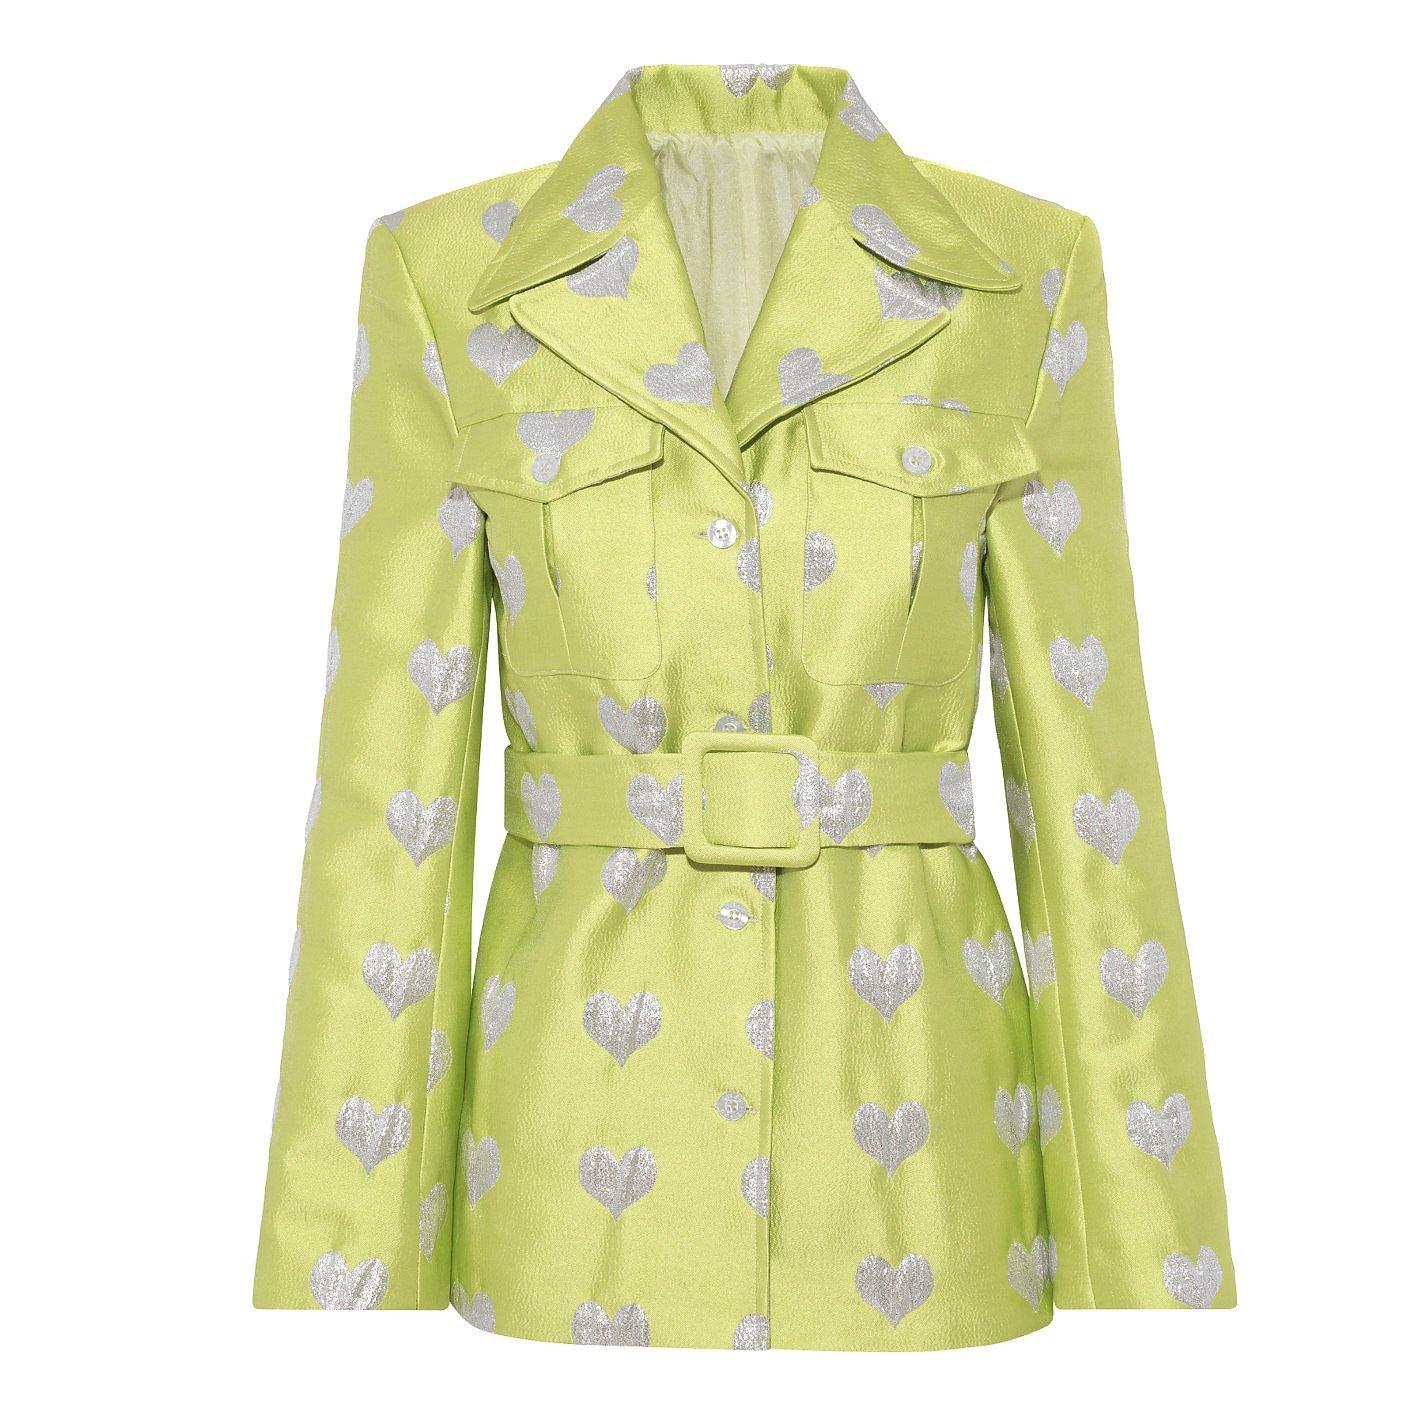 Lisou Lucille Heart Jacquard Jacket